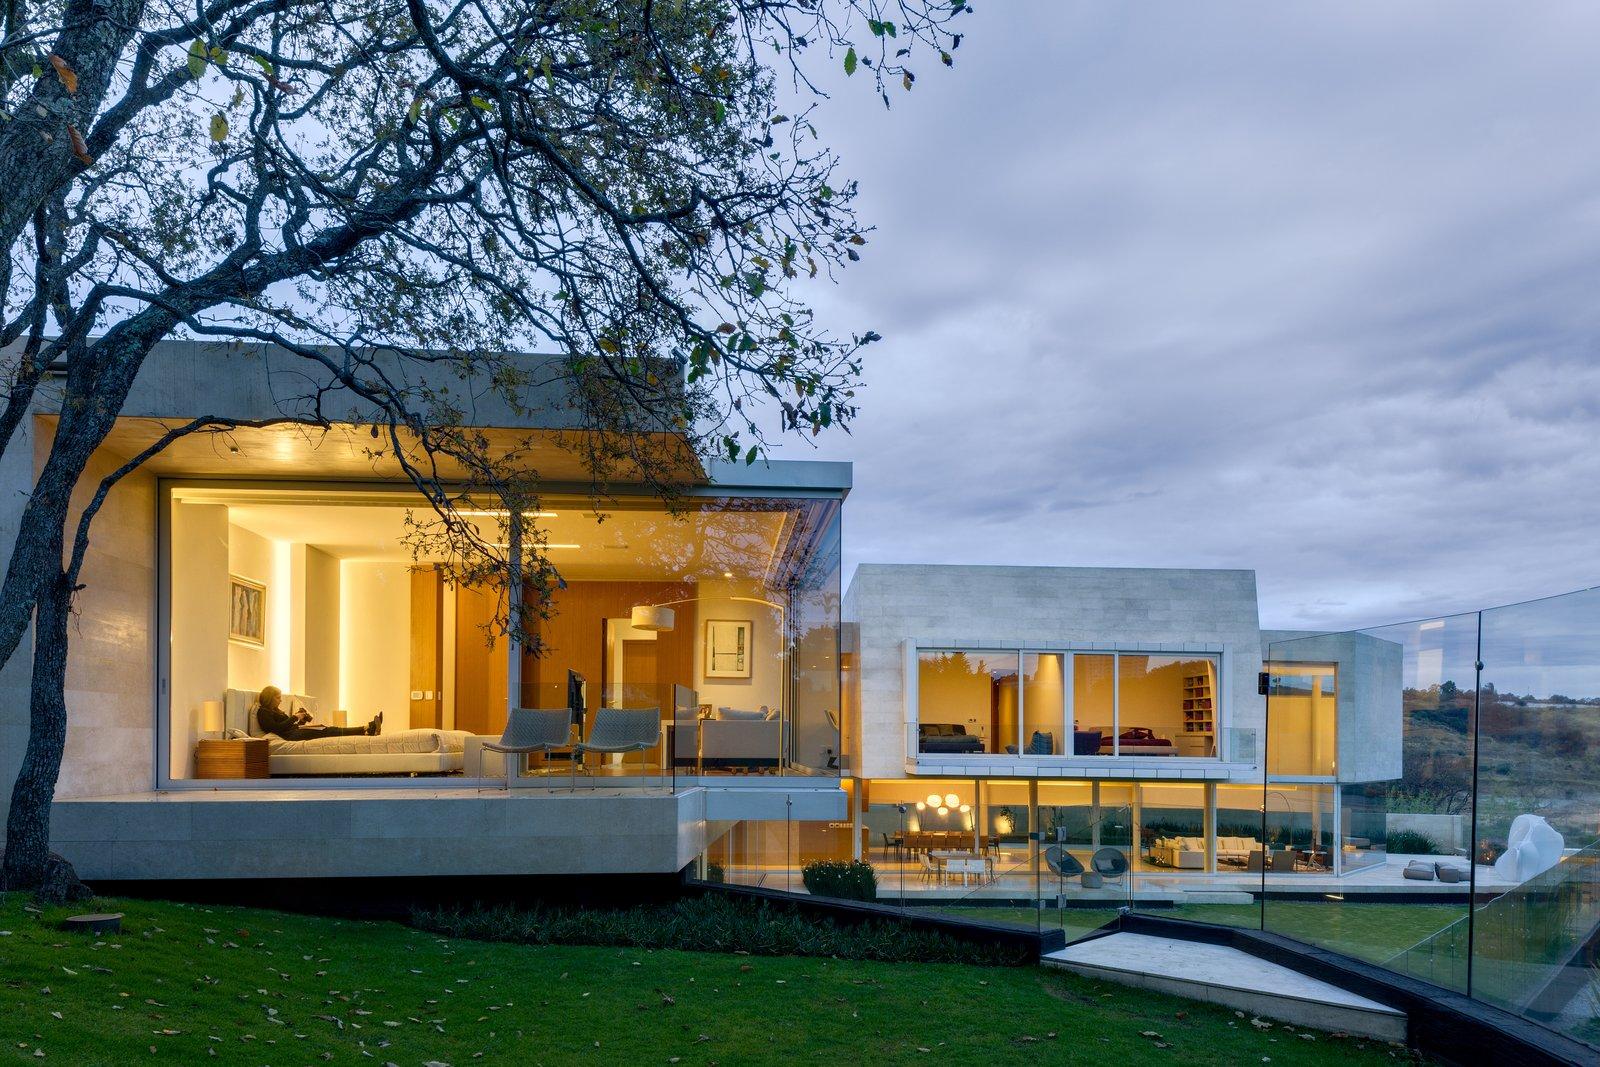 Country Club Residence by Migdal Arquitectos | Jaime Varon, Abraham Metta, Alex Metta